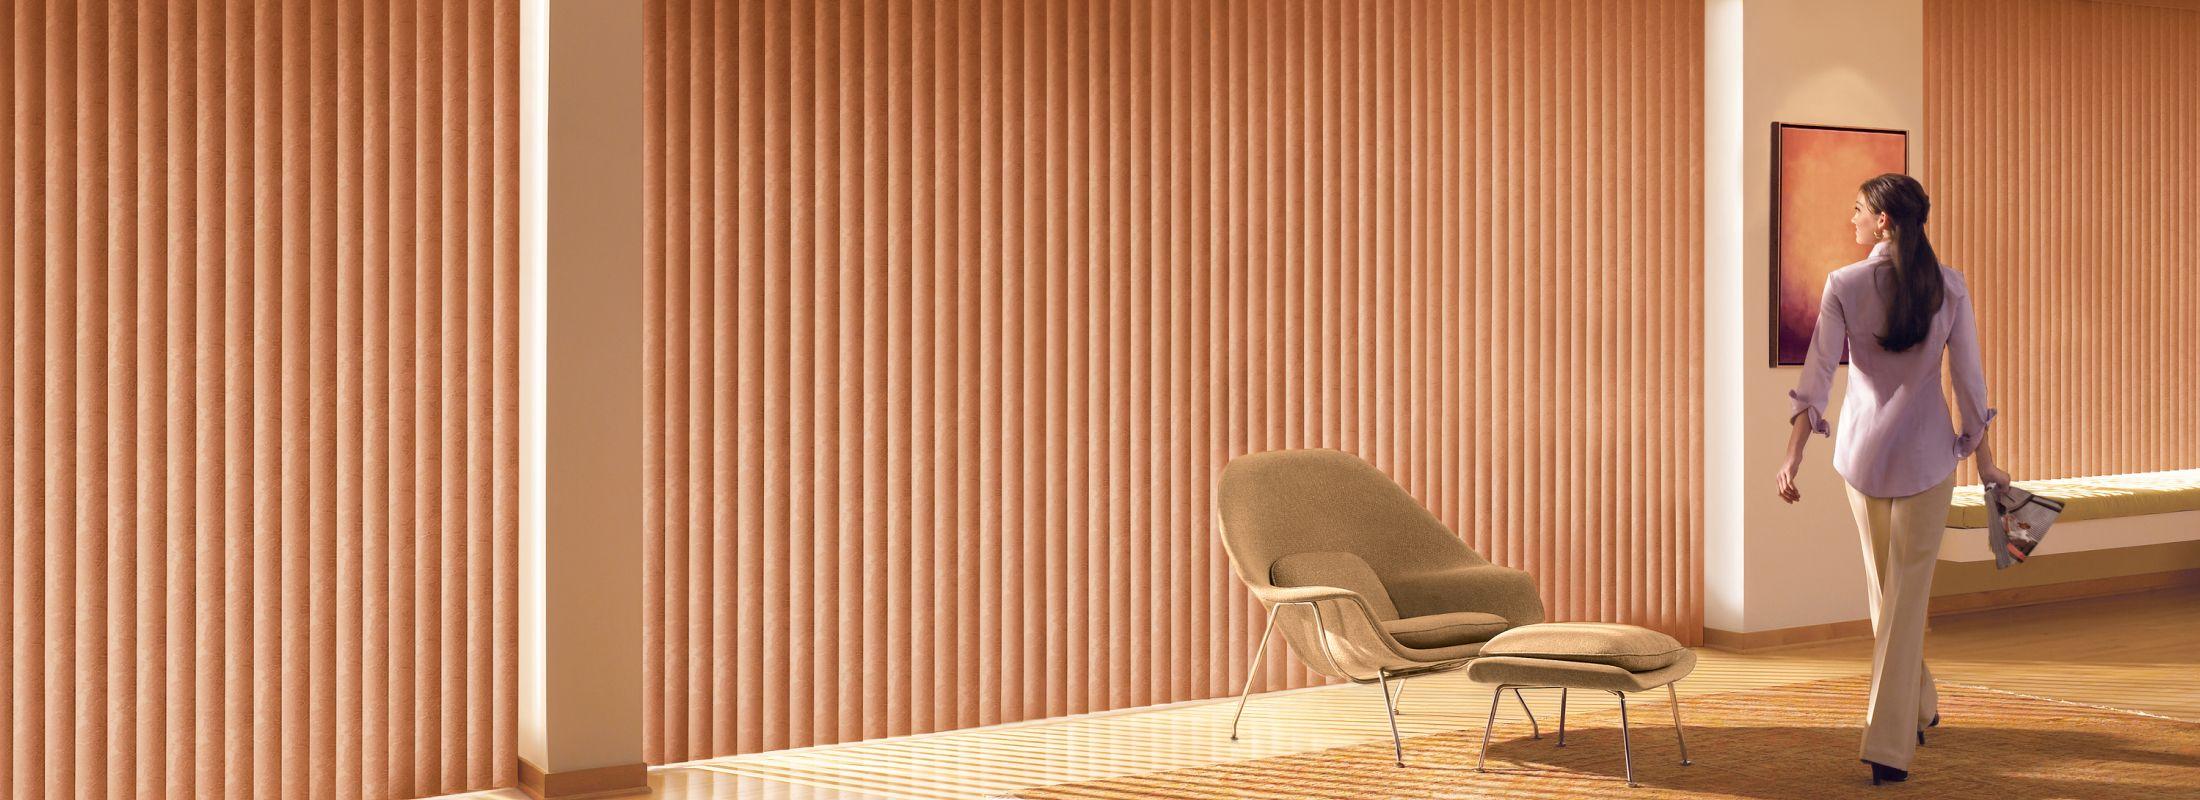 Aluminum blinds in Tremont Style Barnwood - Somner